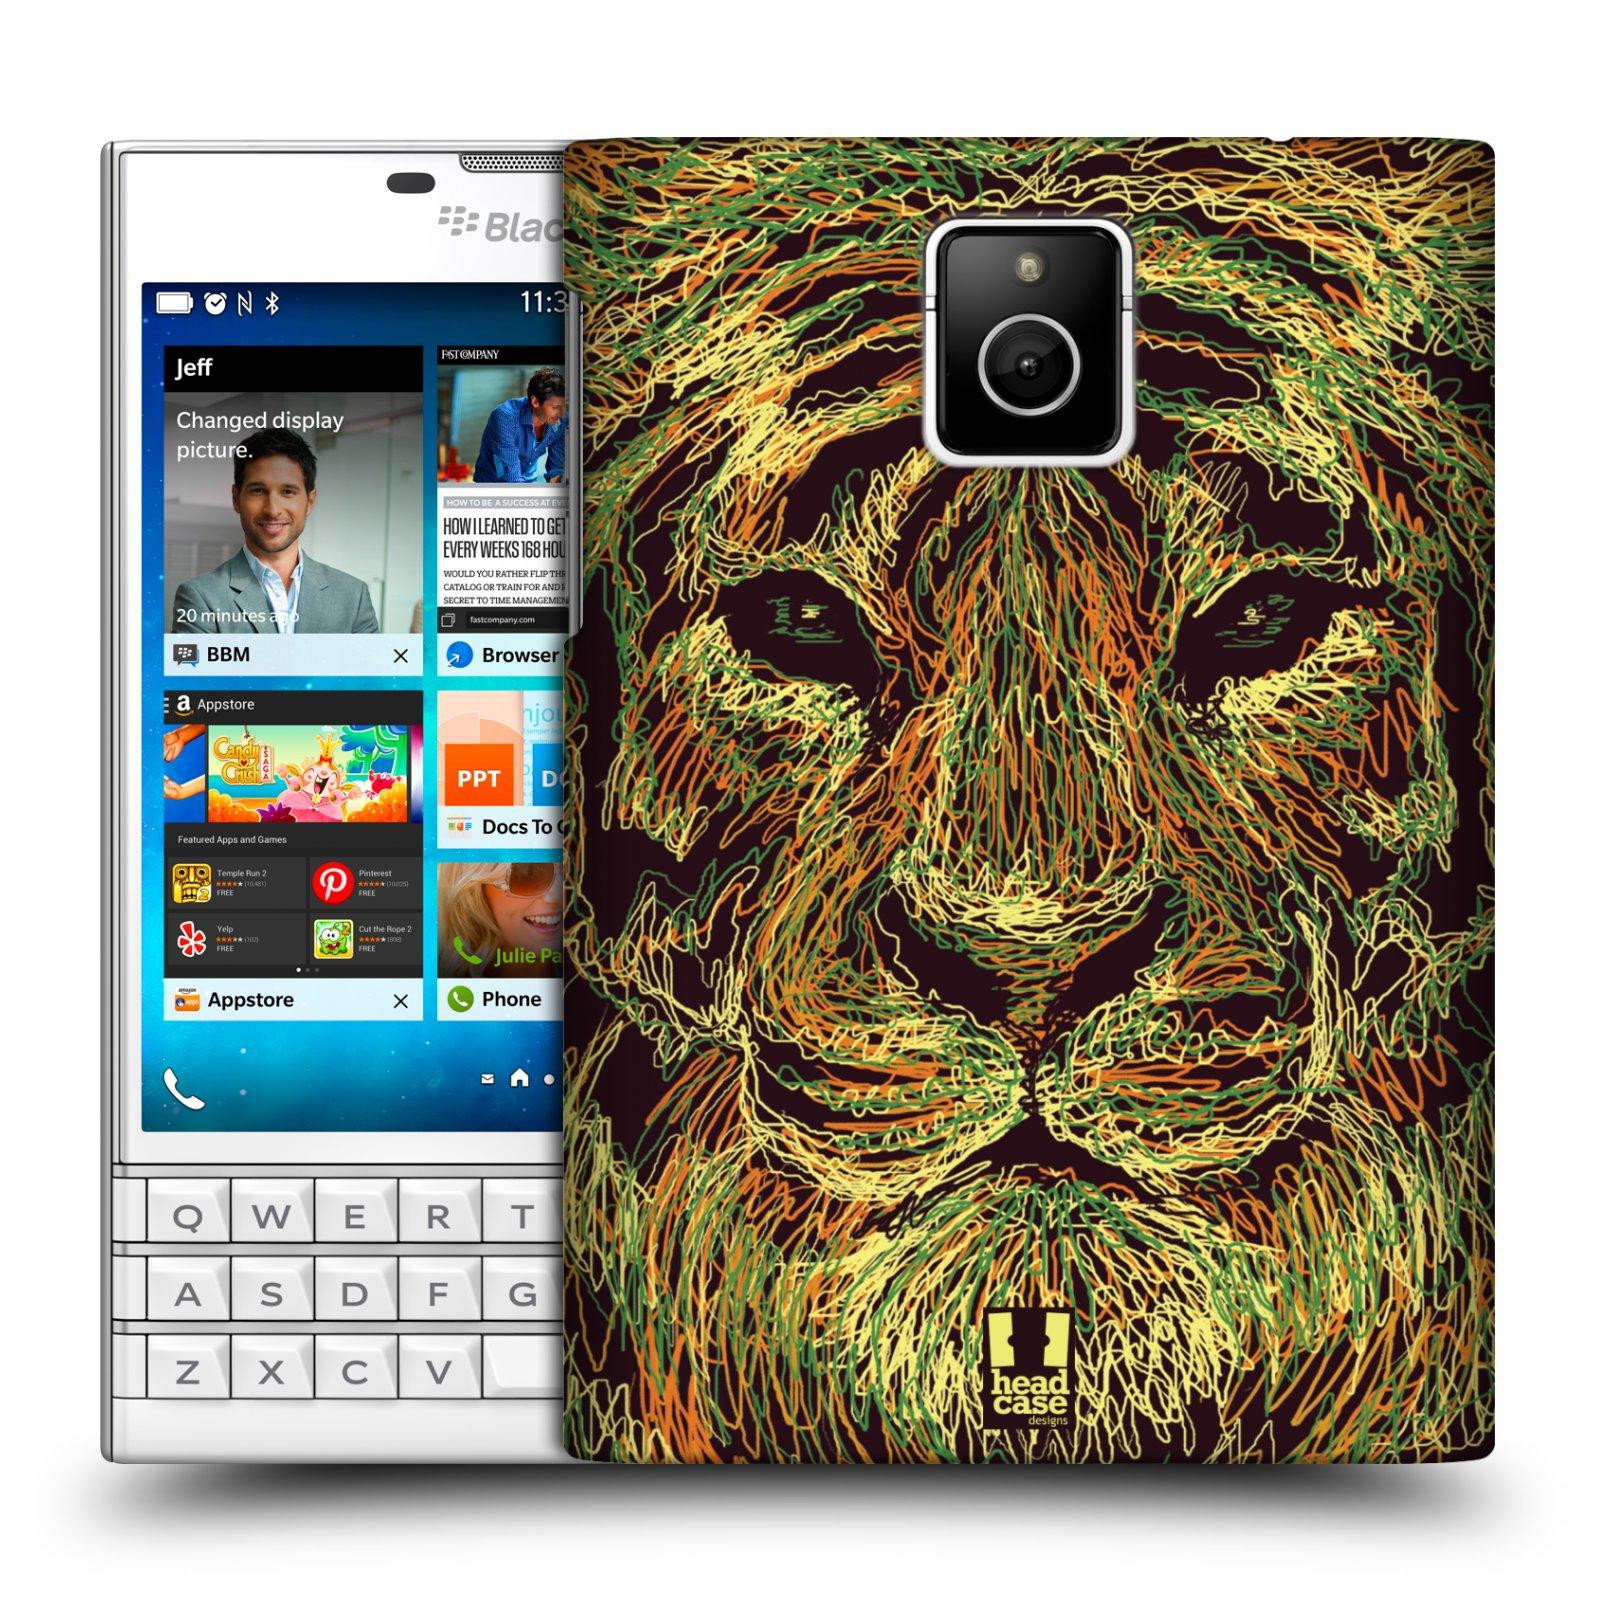 HEAD CASE plastový obal na mobil BlackBerry Passport vzor zvíře čmáranice tygr